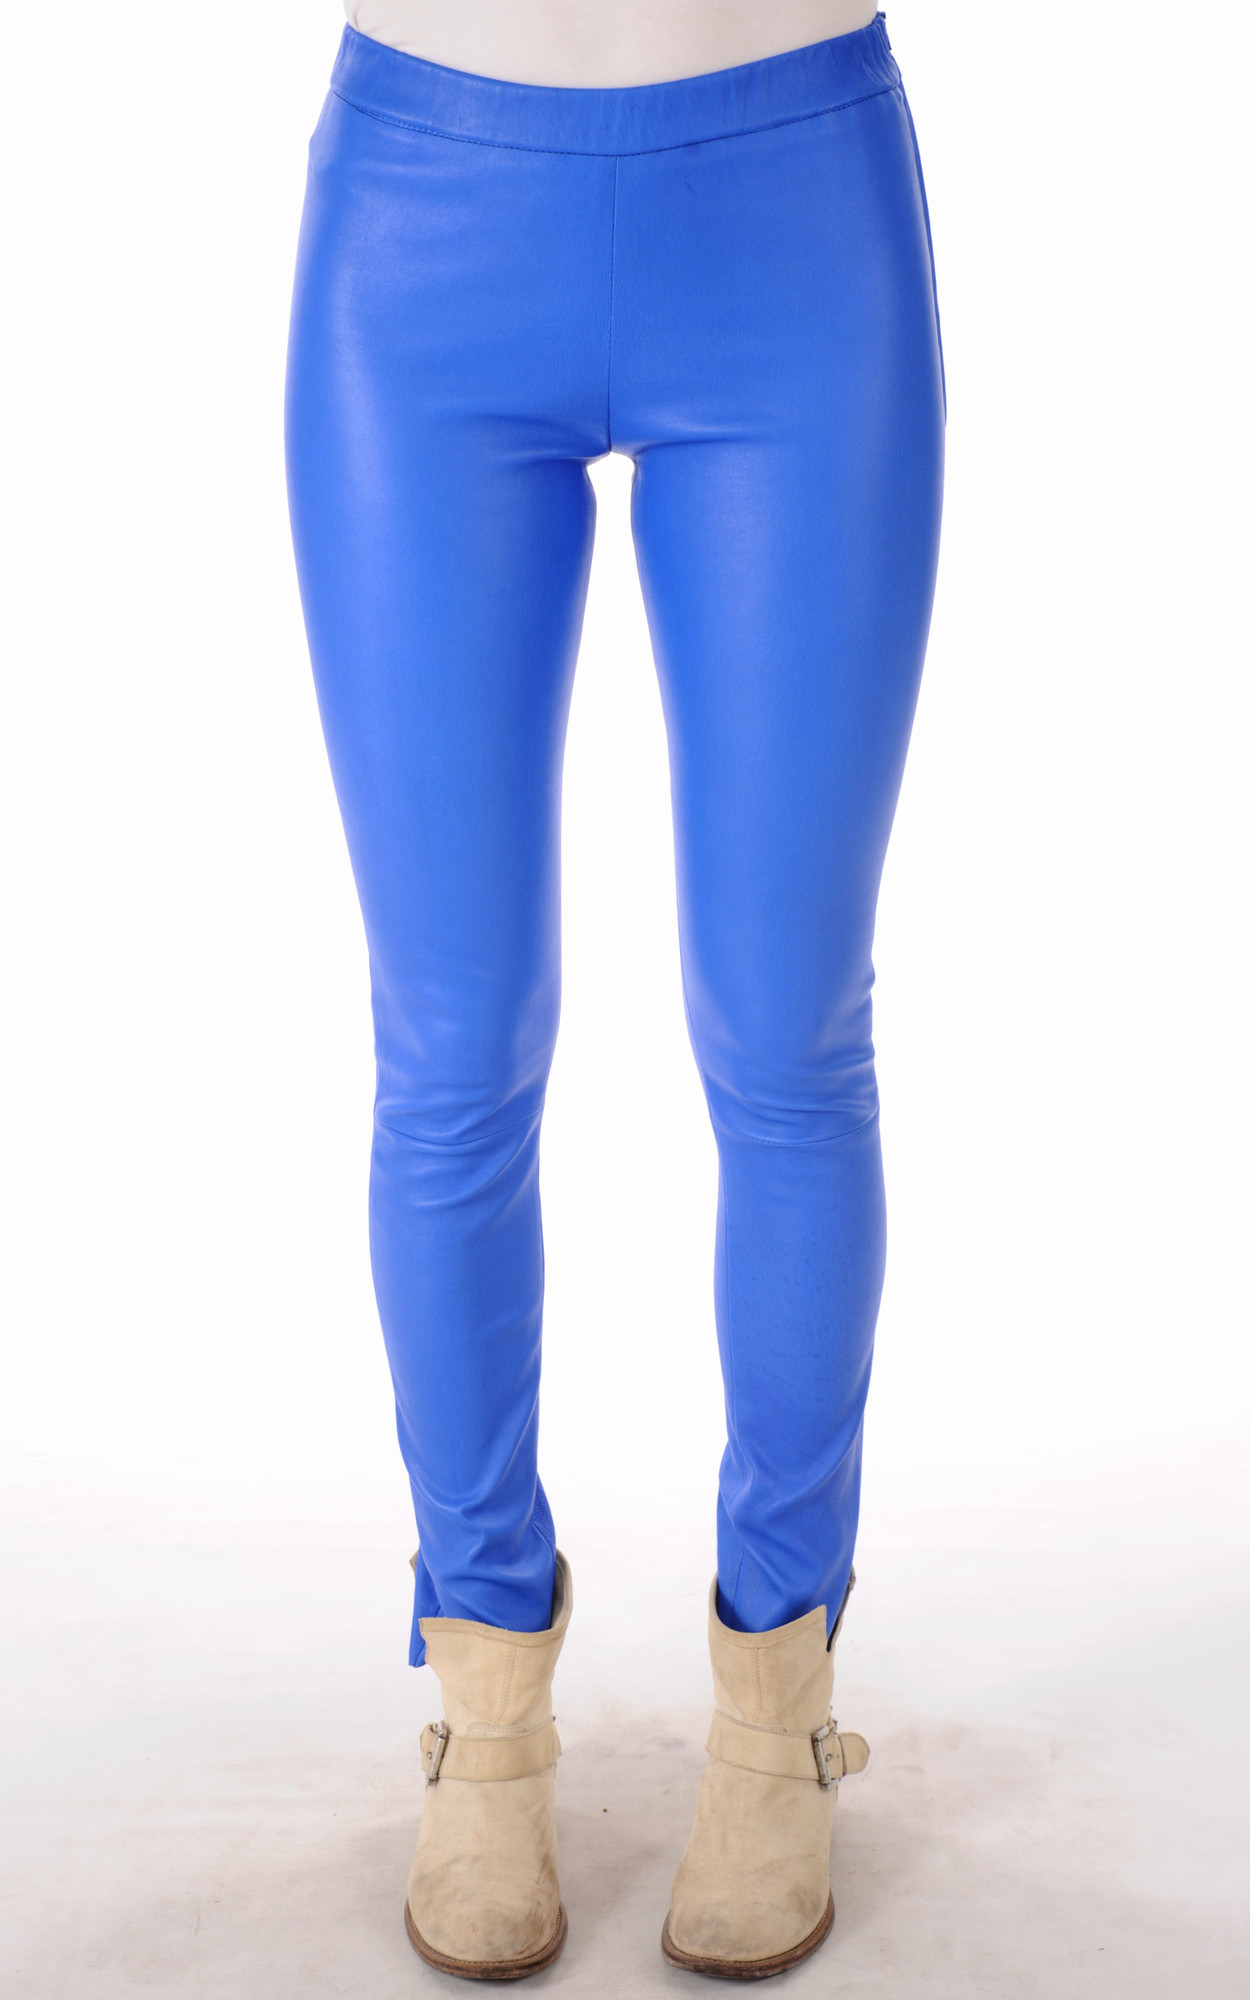 Leggings Cuir Bleu Electrique1